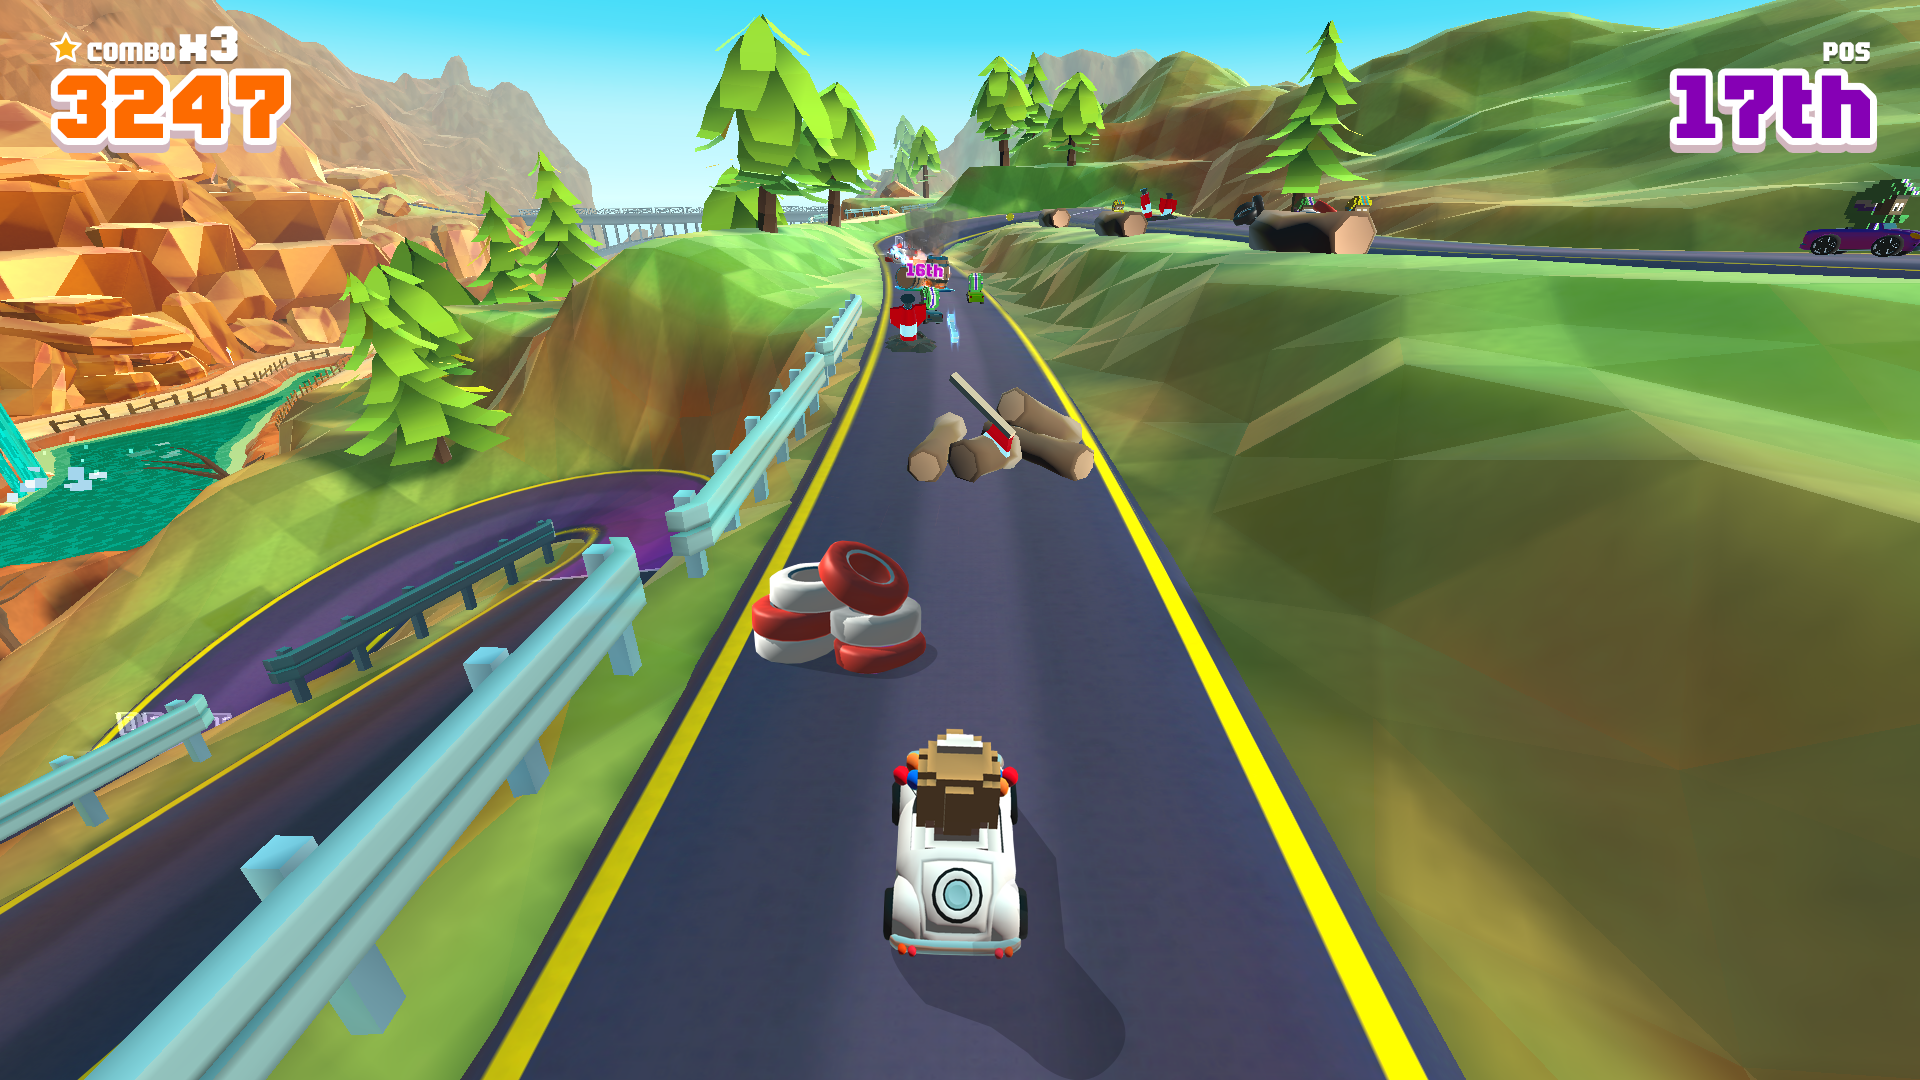 Blocky Racer - Endless Arcade Racing screenshot 15